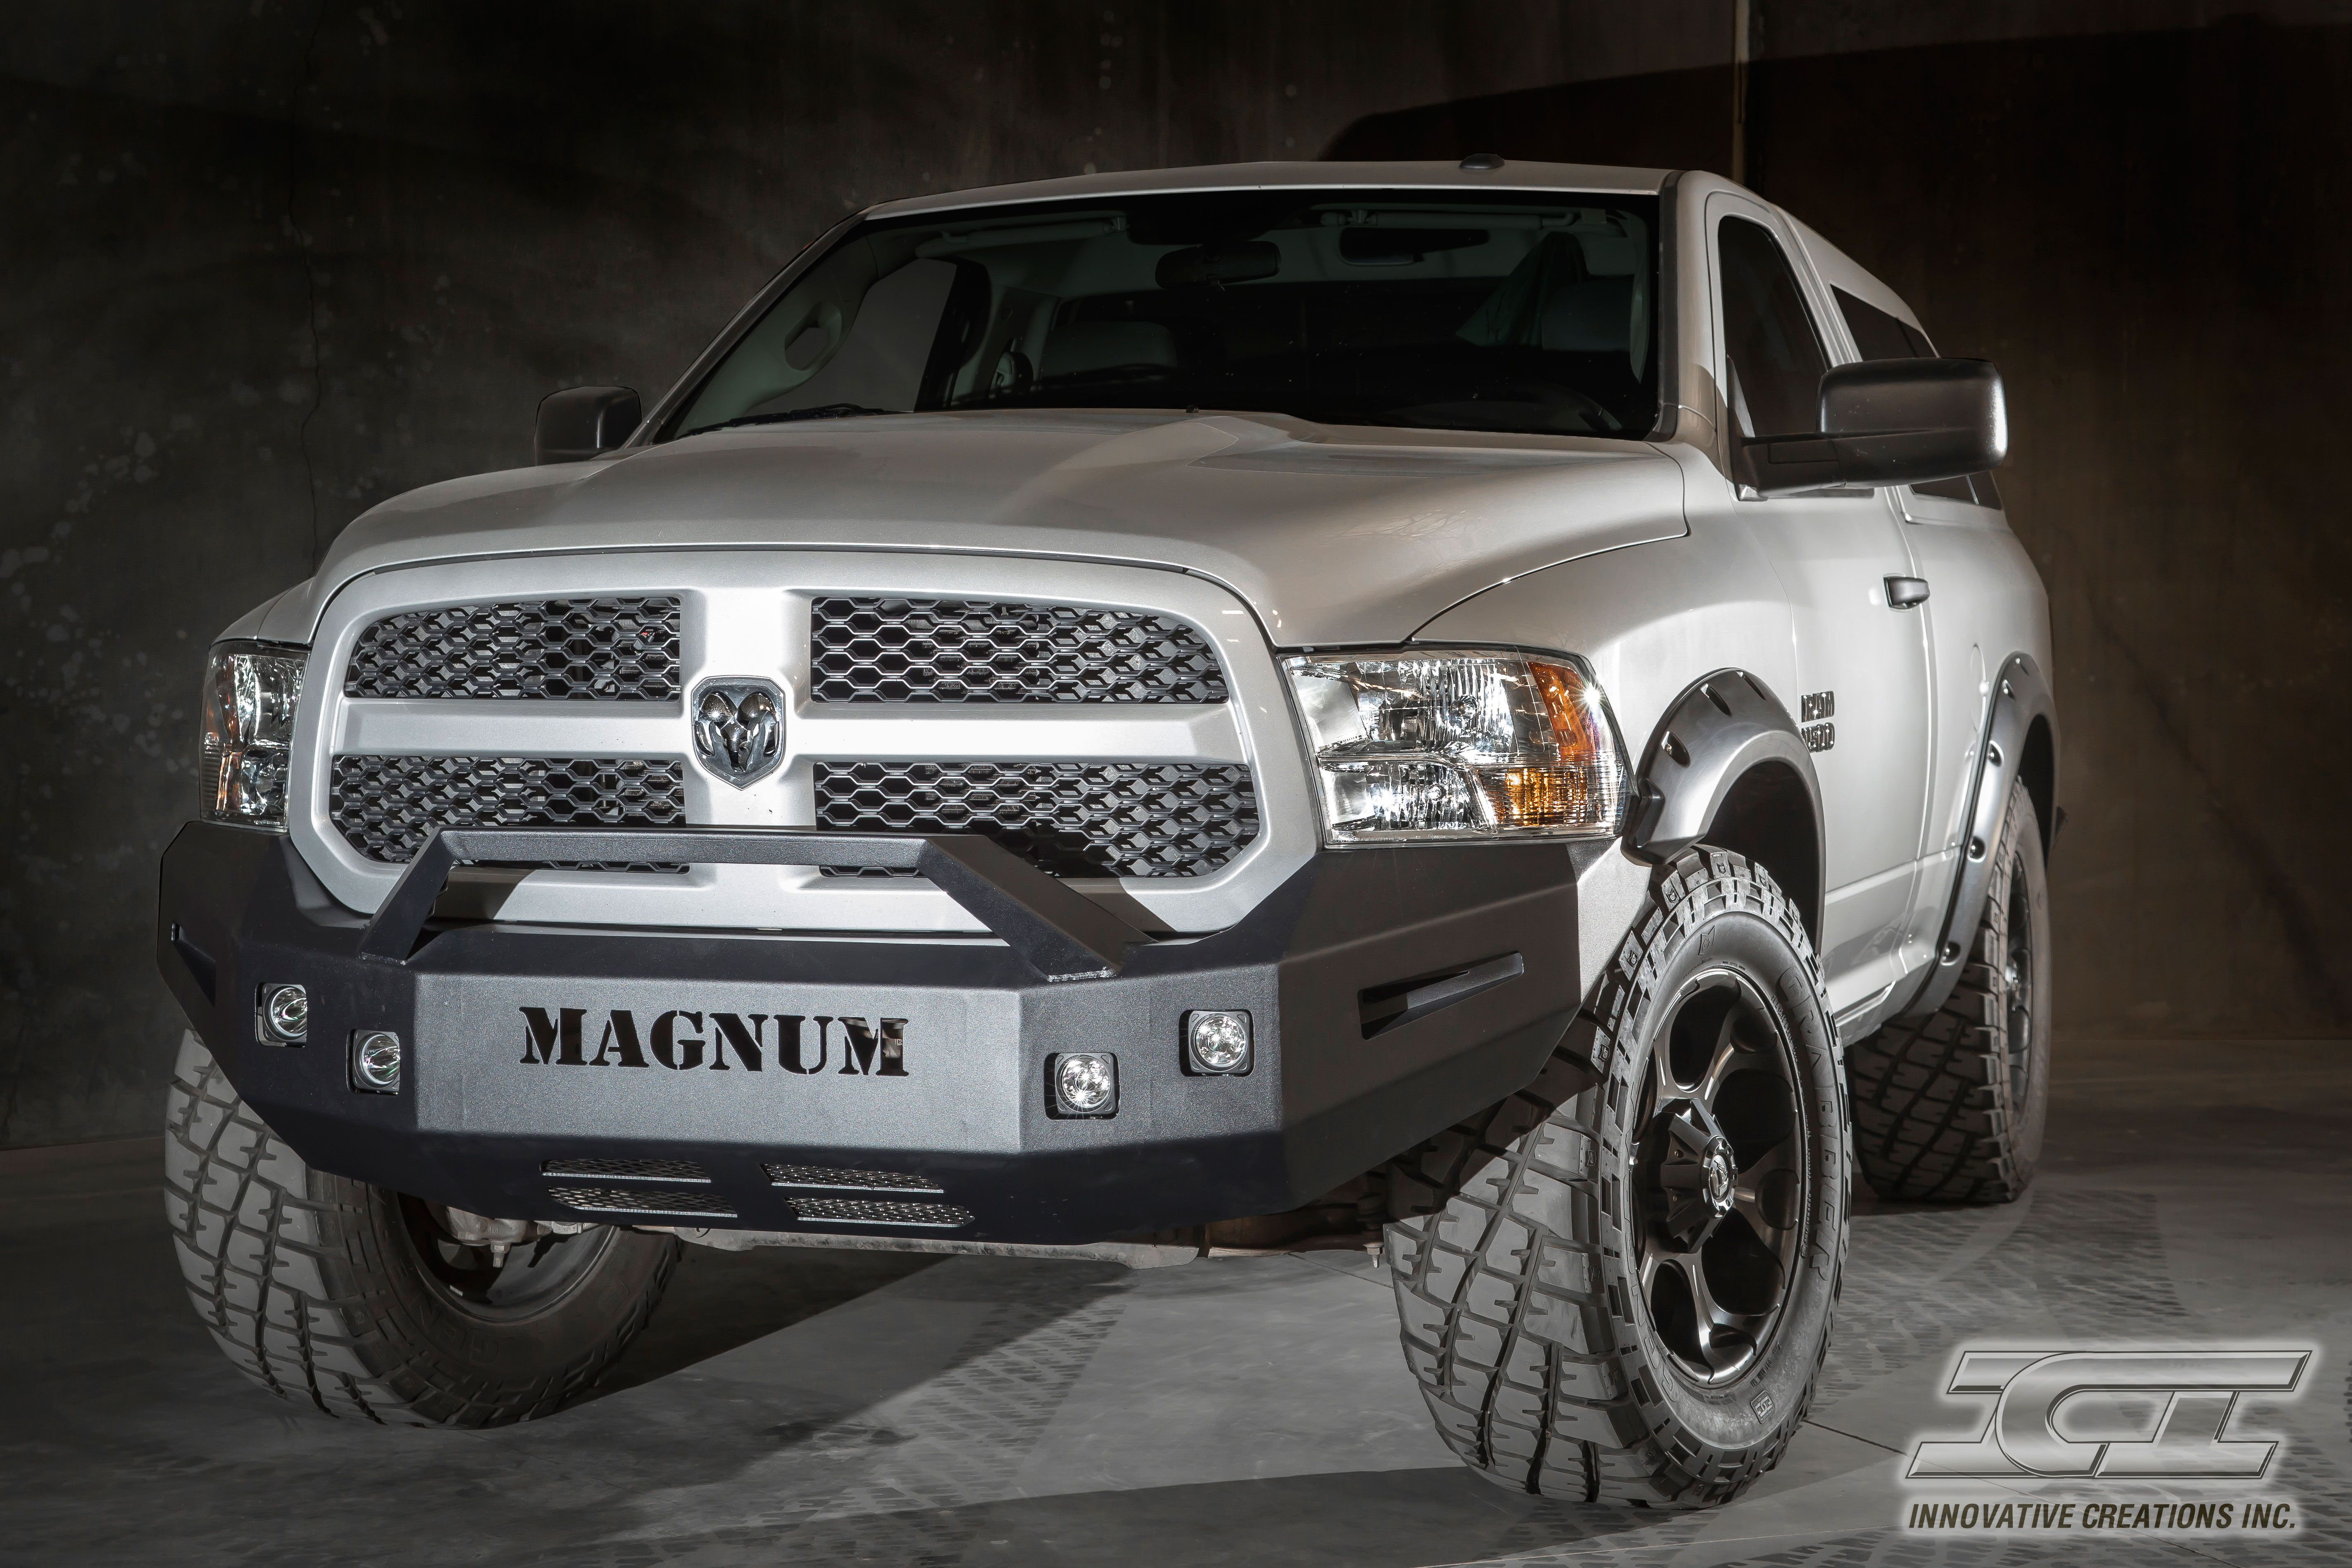 Front Magnum Bumper For 2009 2014 Dodge Ram 1500 Sport And Non Sport Trucks Part Fbm64dgn Dodge Ram Dodge Ram 1500 Dodge Trucks Ram